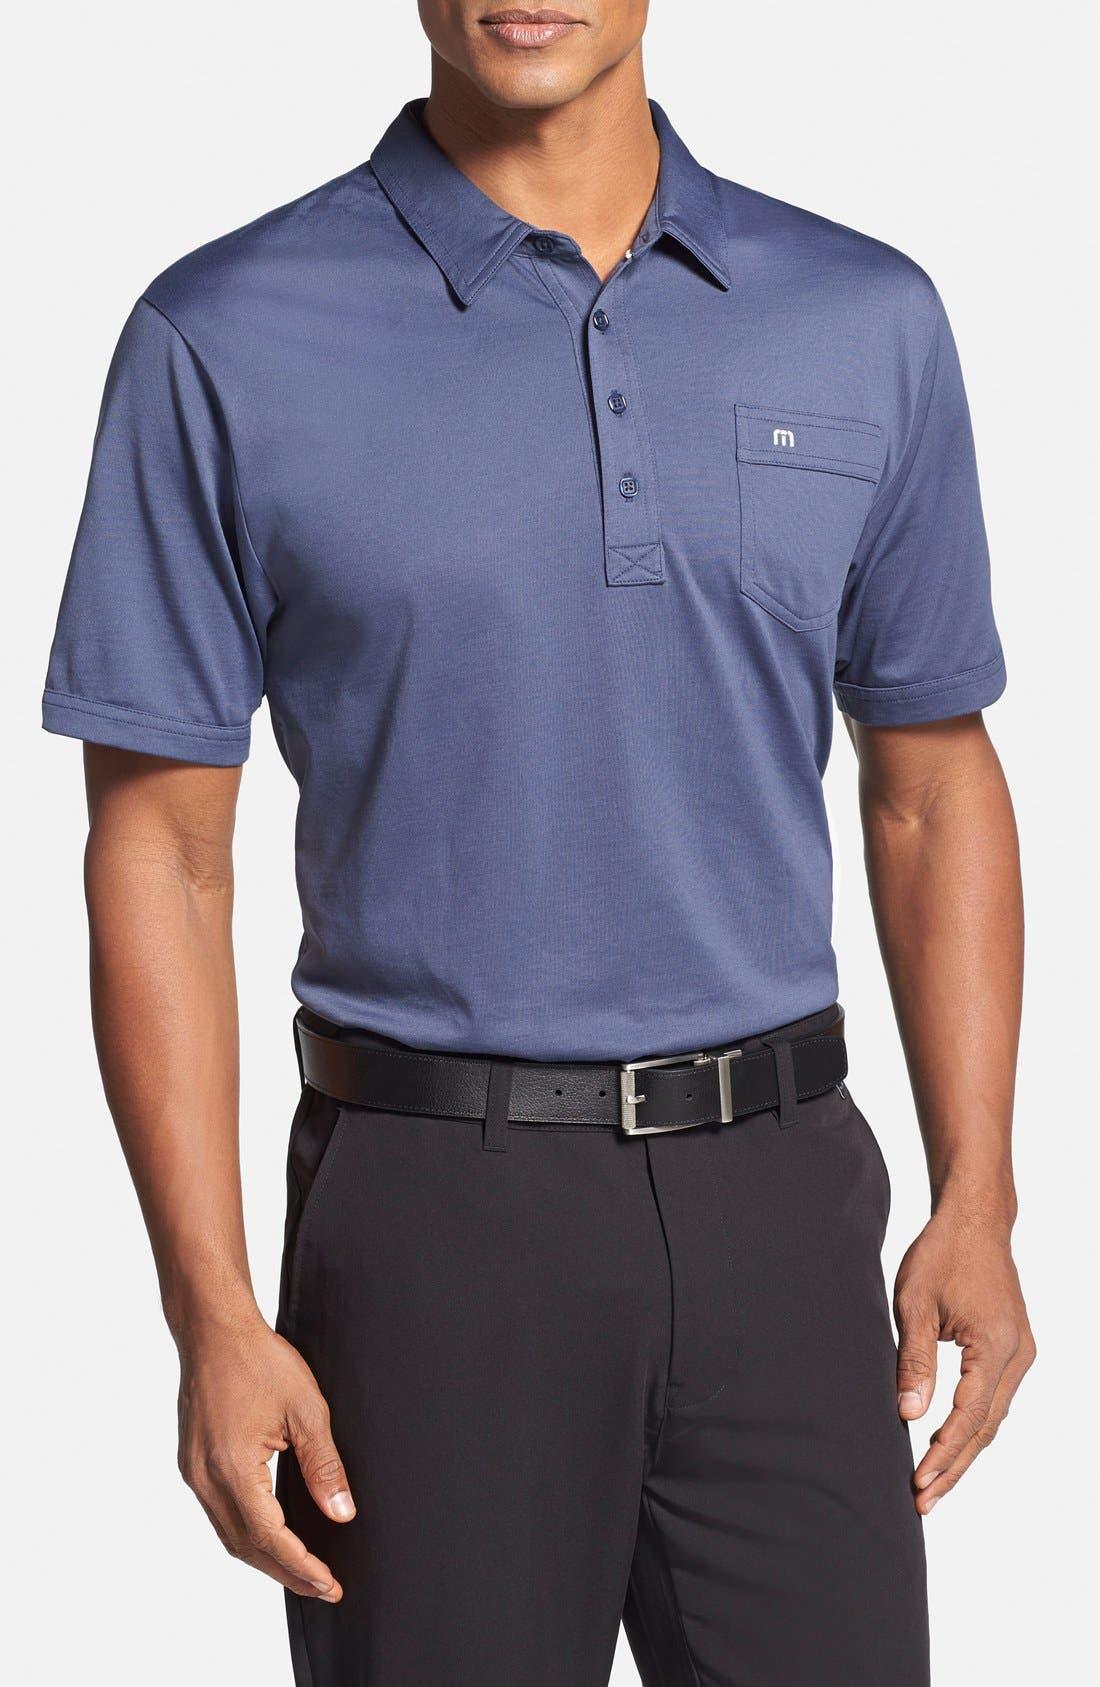 Alternate Image 1 Selected - Travis Mathew 'OG' Trim Fit Performance Golf Polo